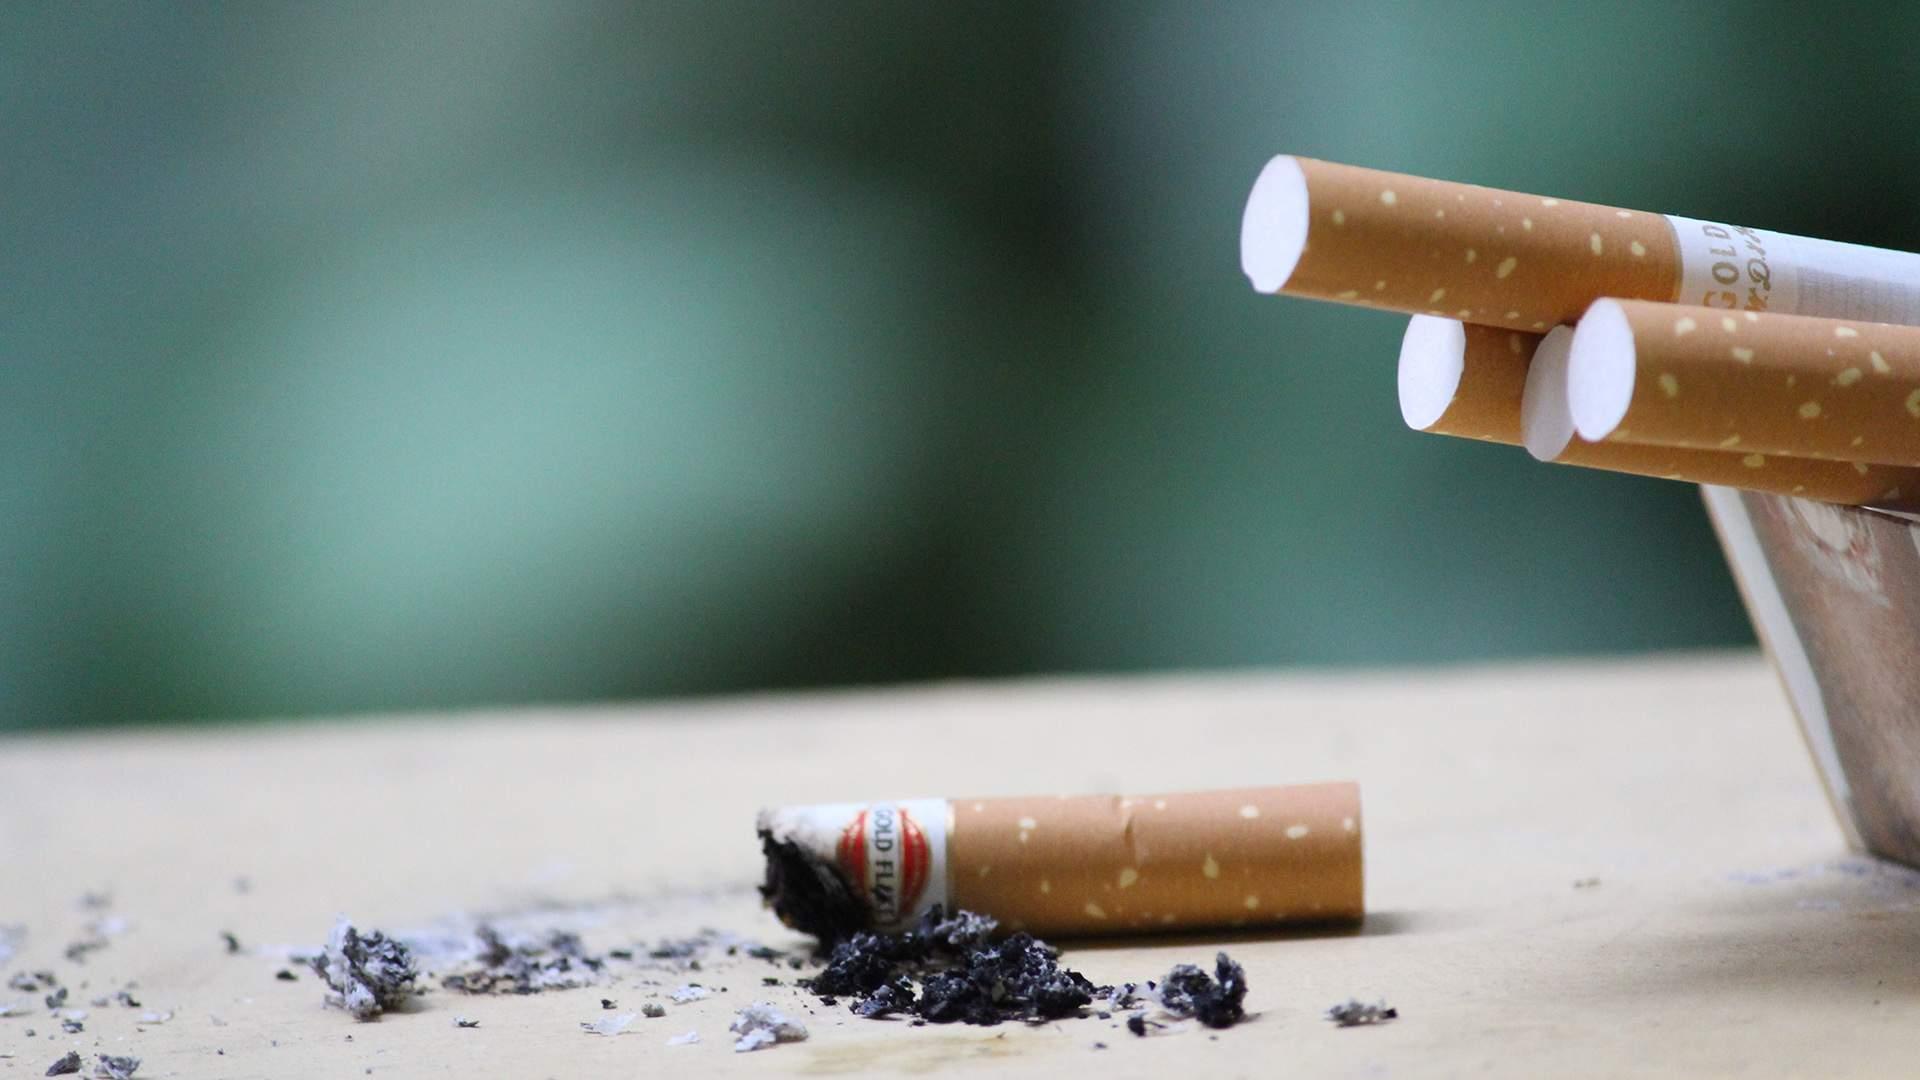 North Sydney Looks Set to Become Australia's First Smoke-Free CBD